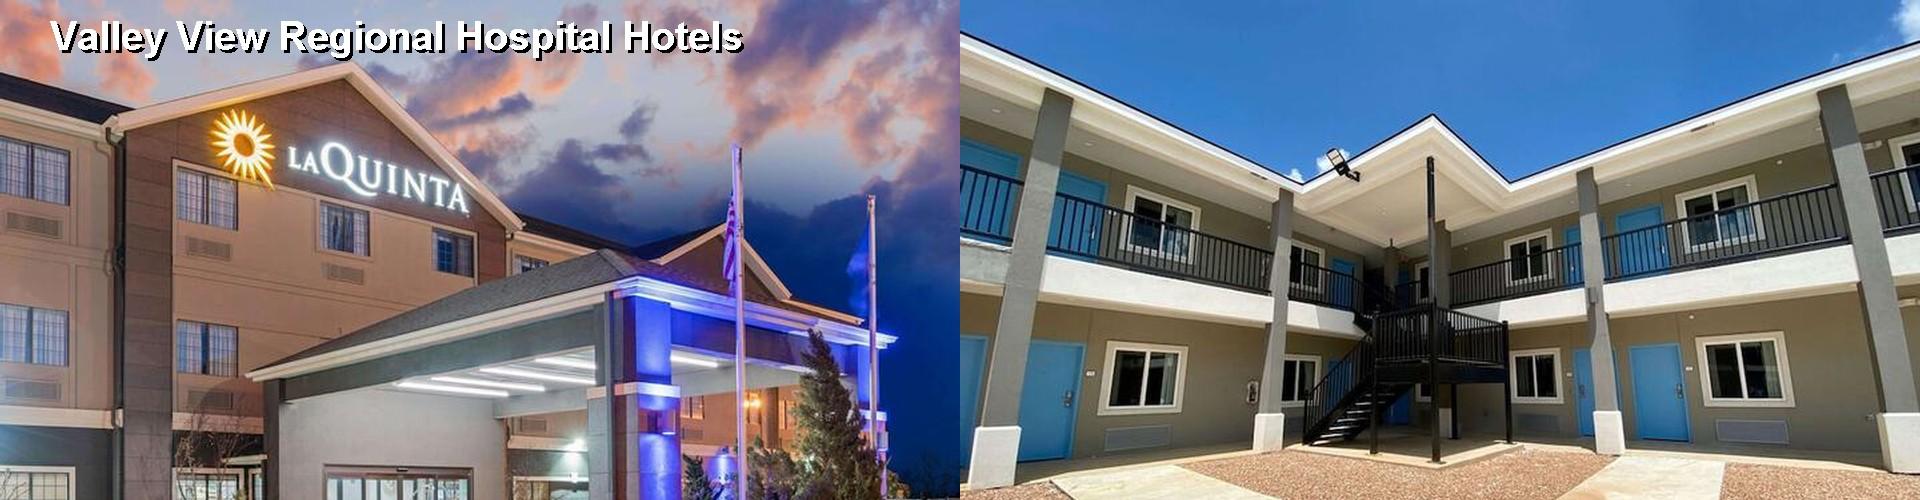 5 Best Hotels Near Valley View Regional Hospital